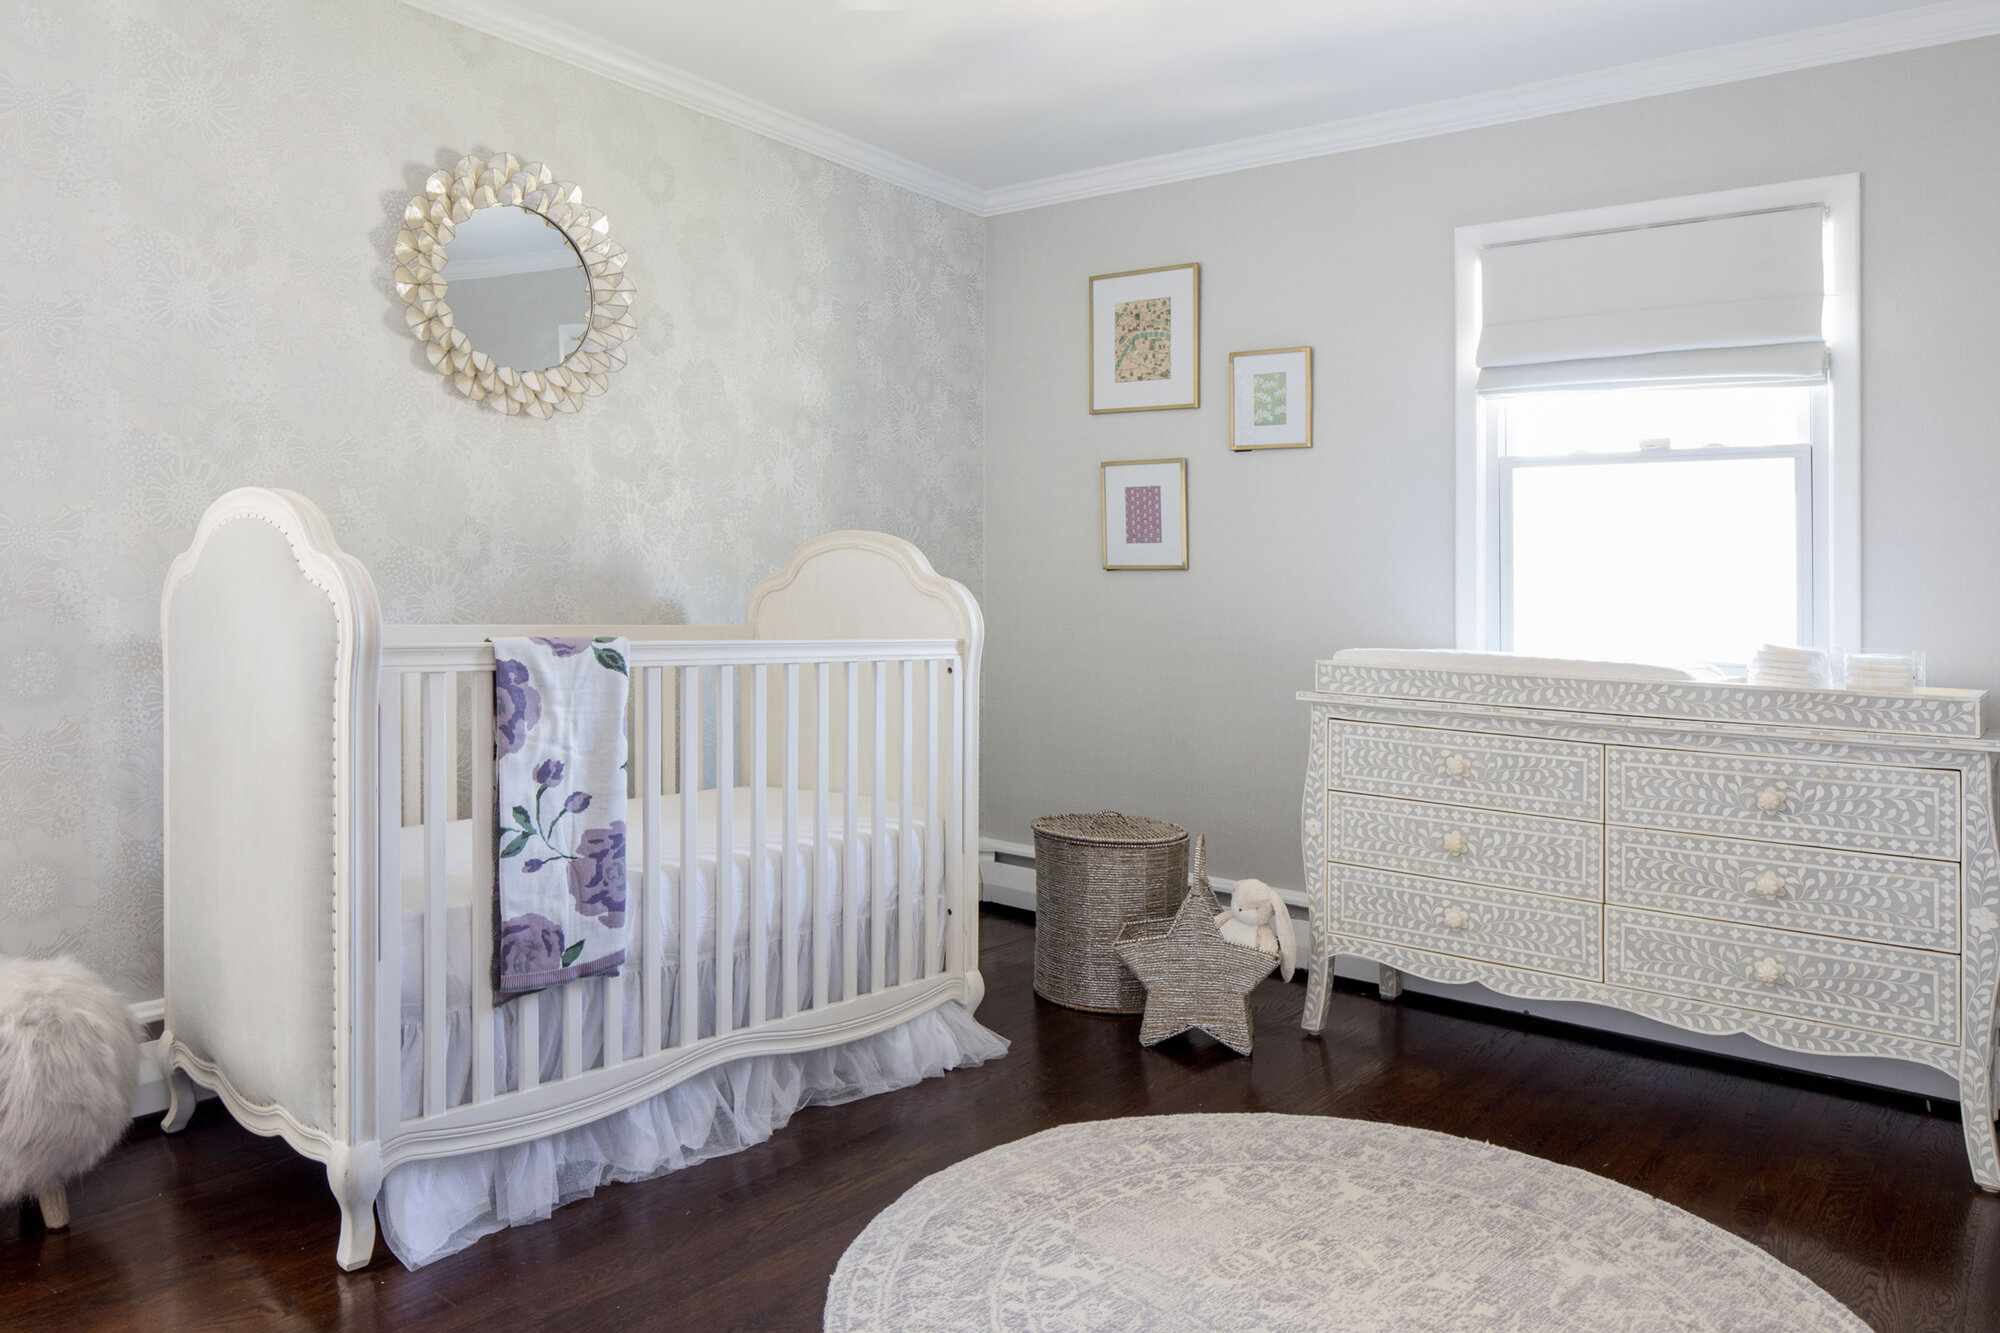 white nursery with light purple accents, vintage dresser